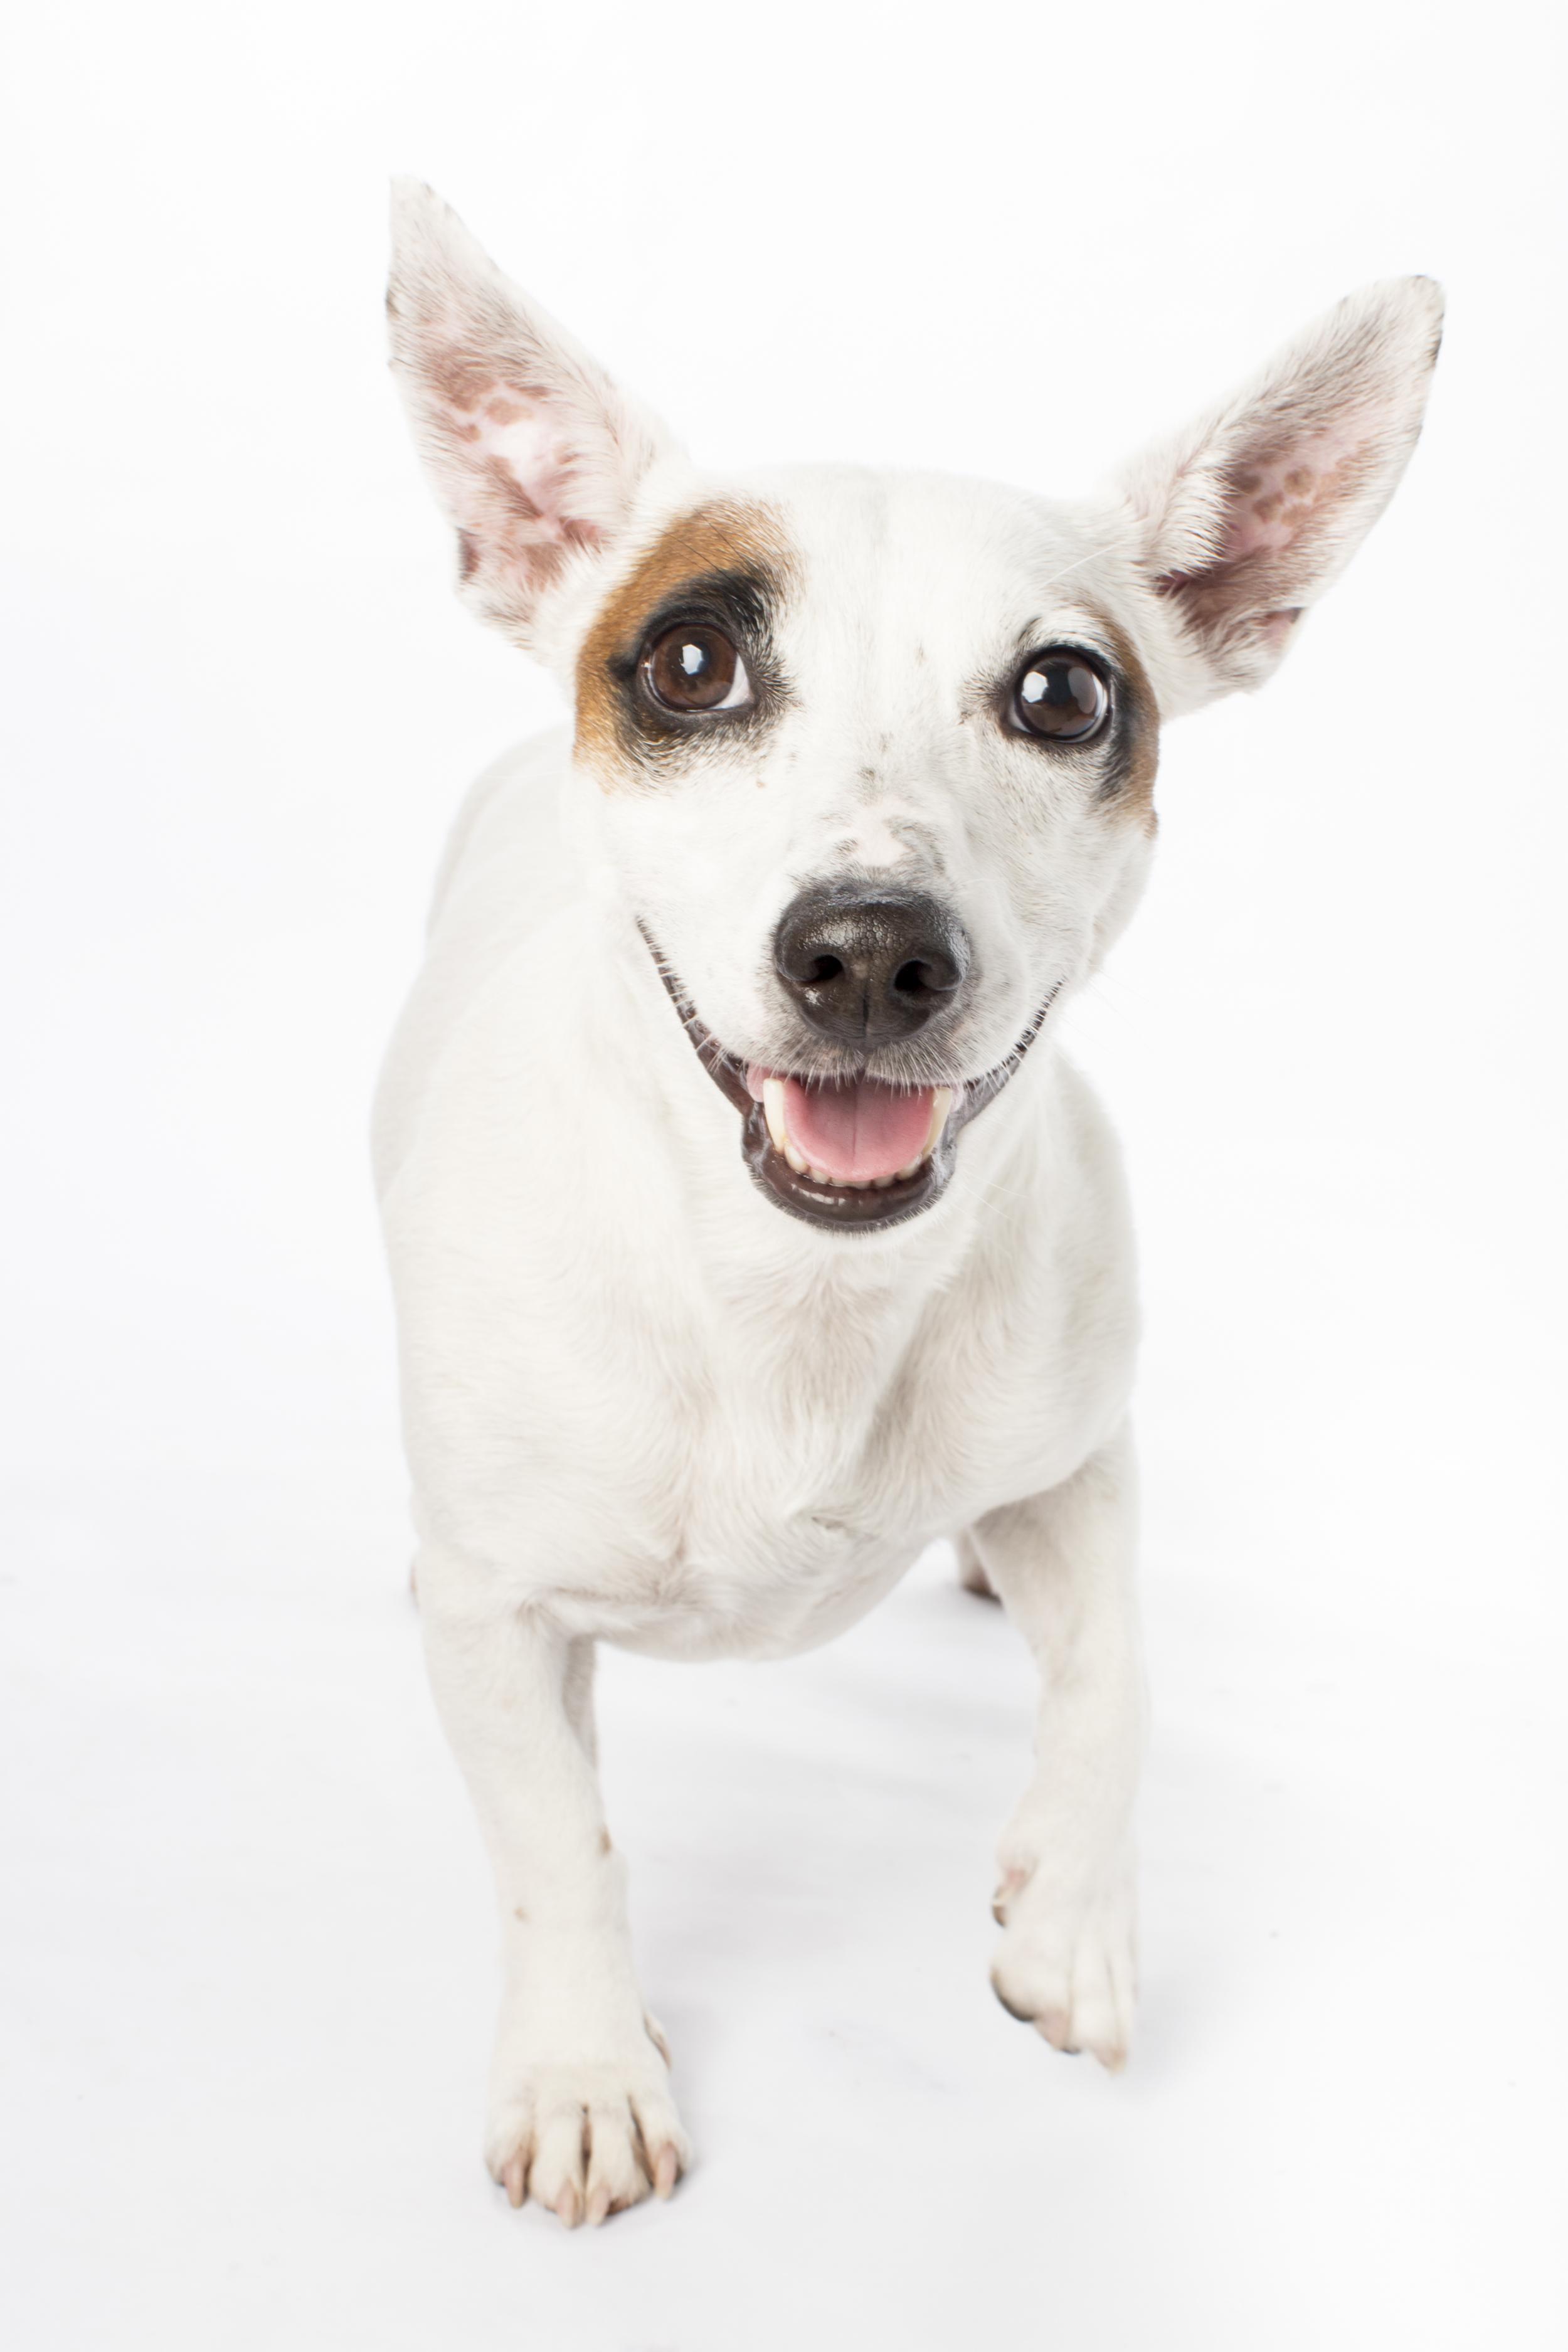 01 Tan eye patch white dog studio pet photography session on white.jpg